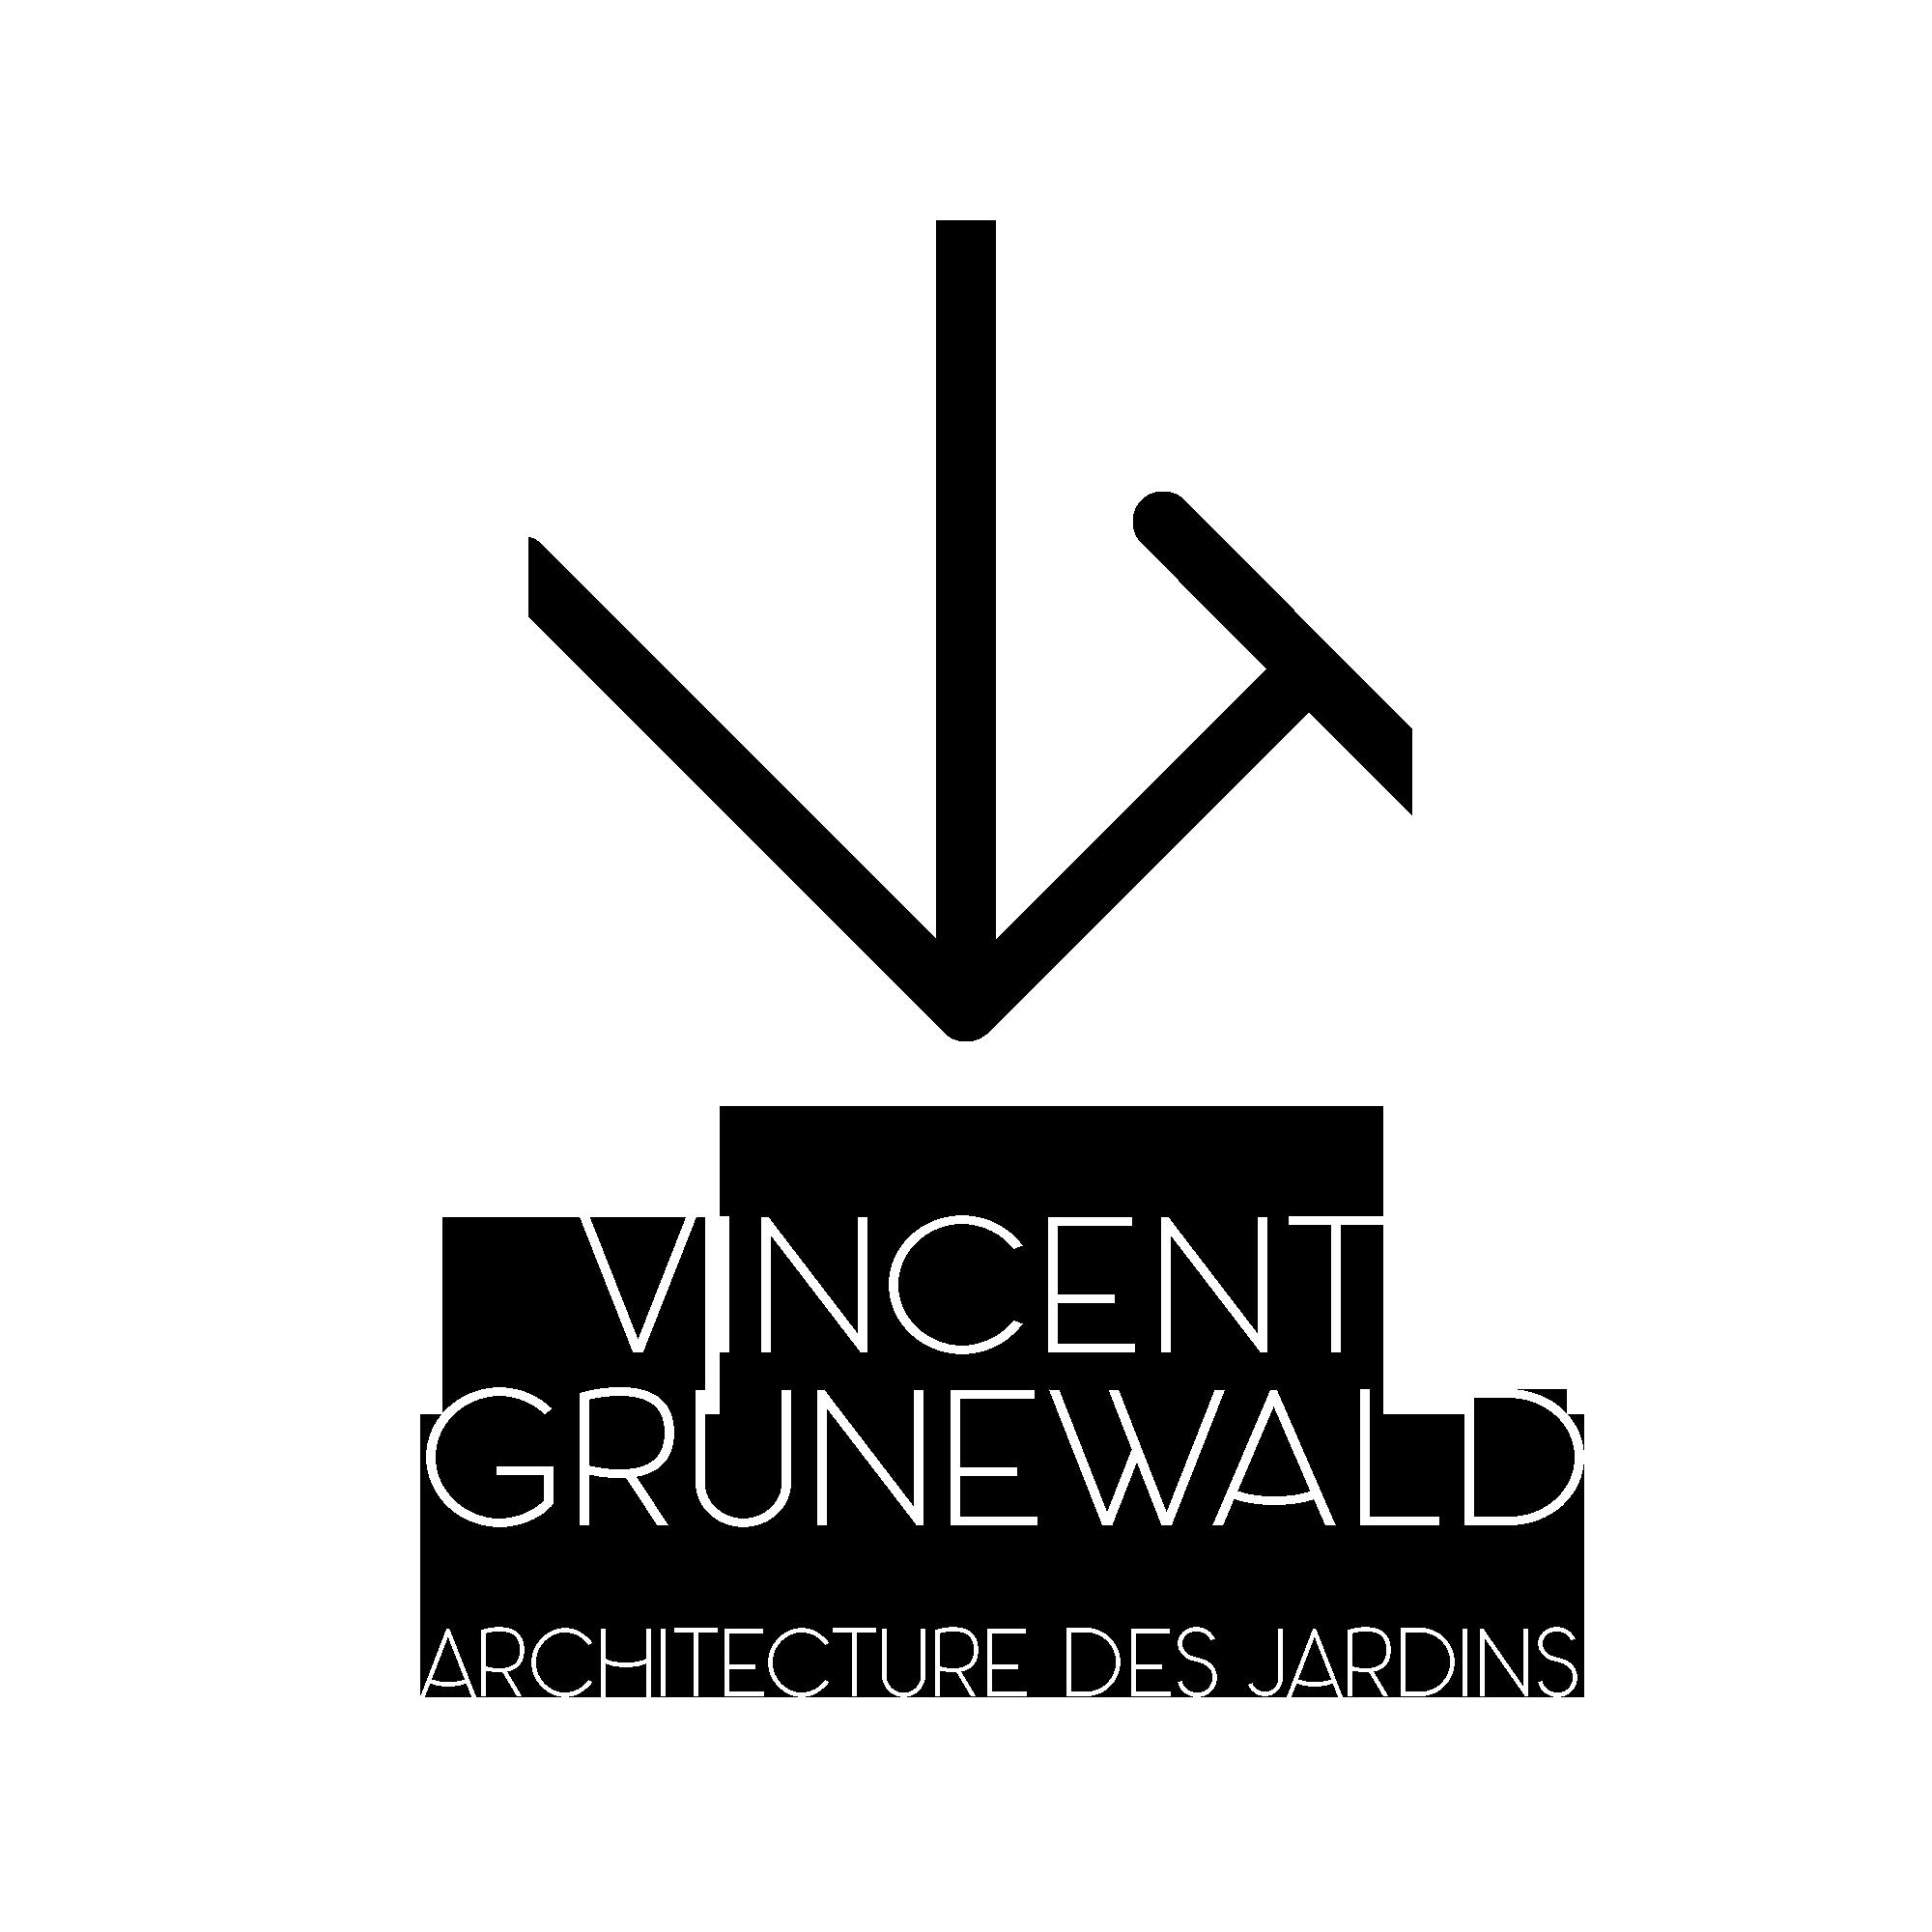 Vincent Grunewald